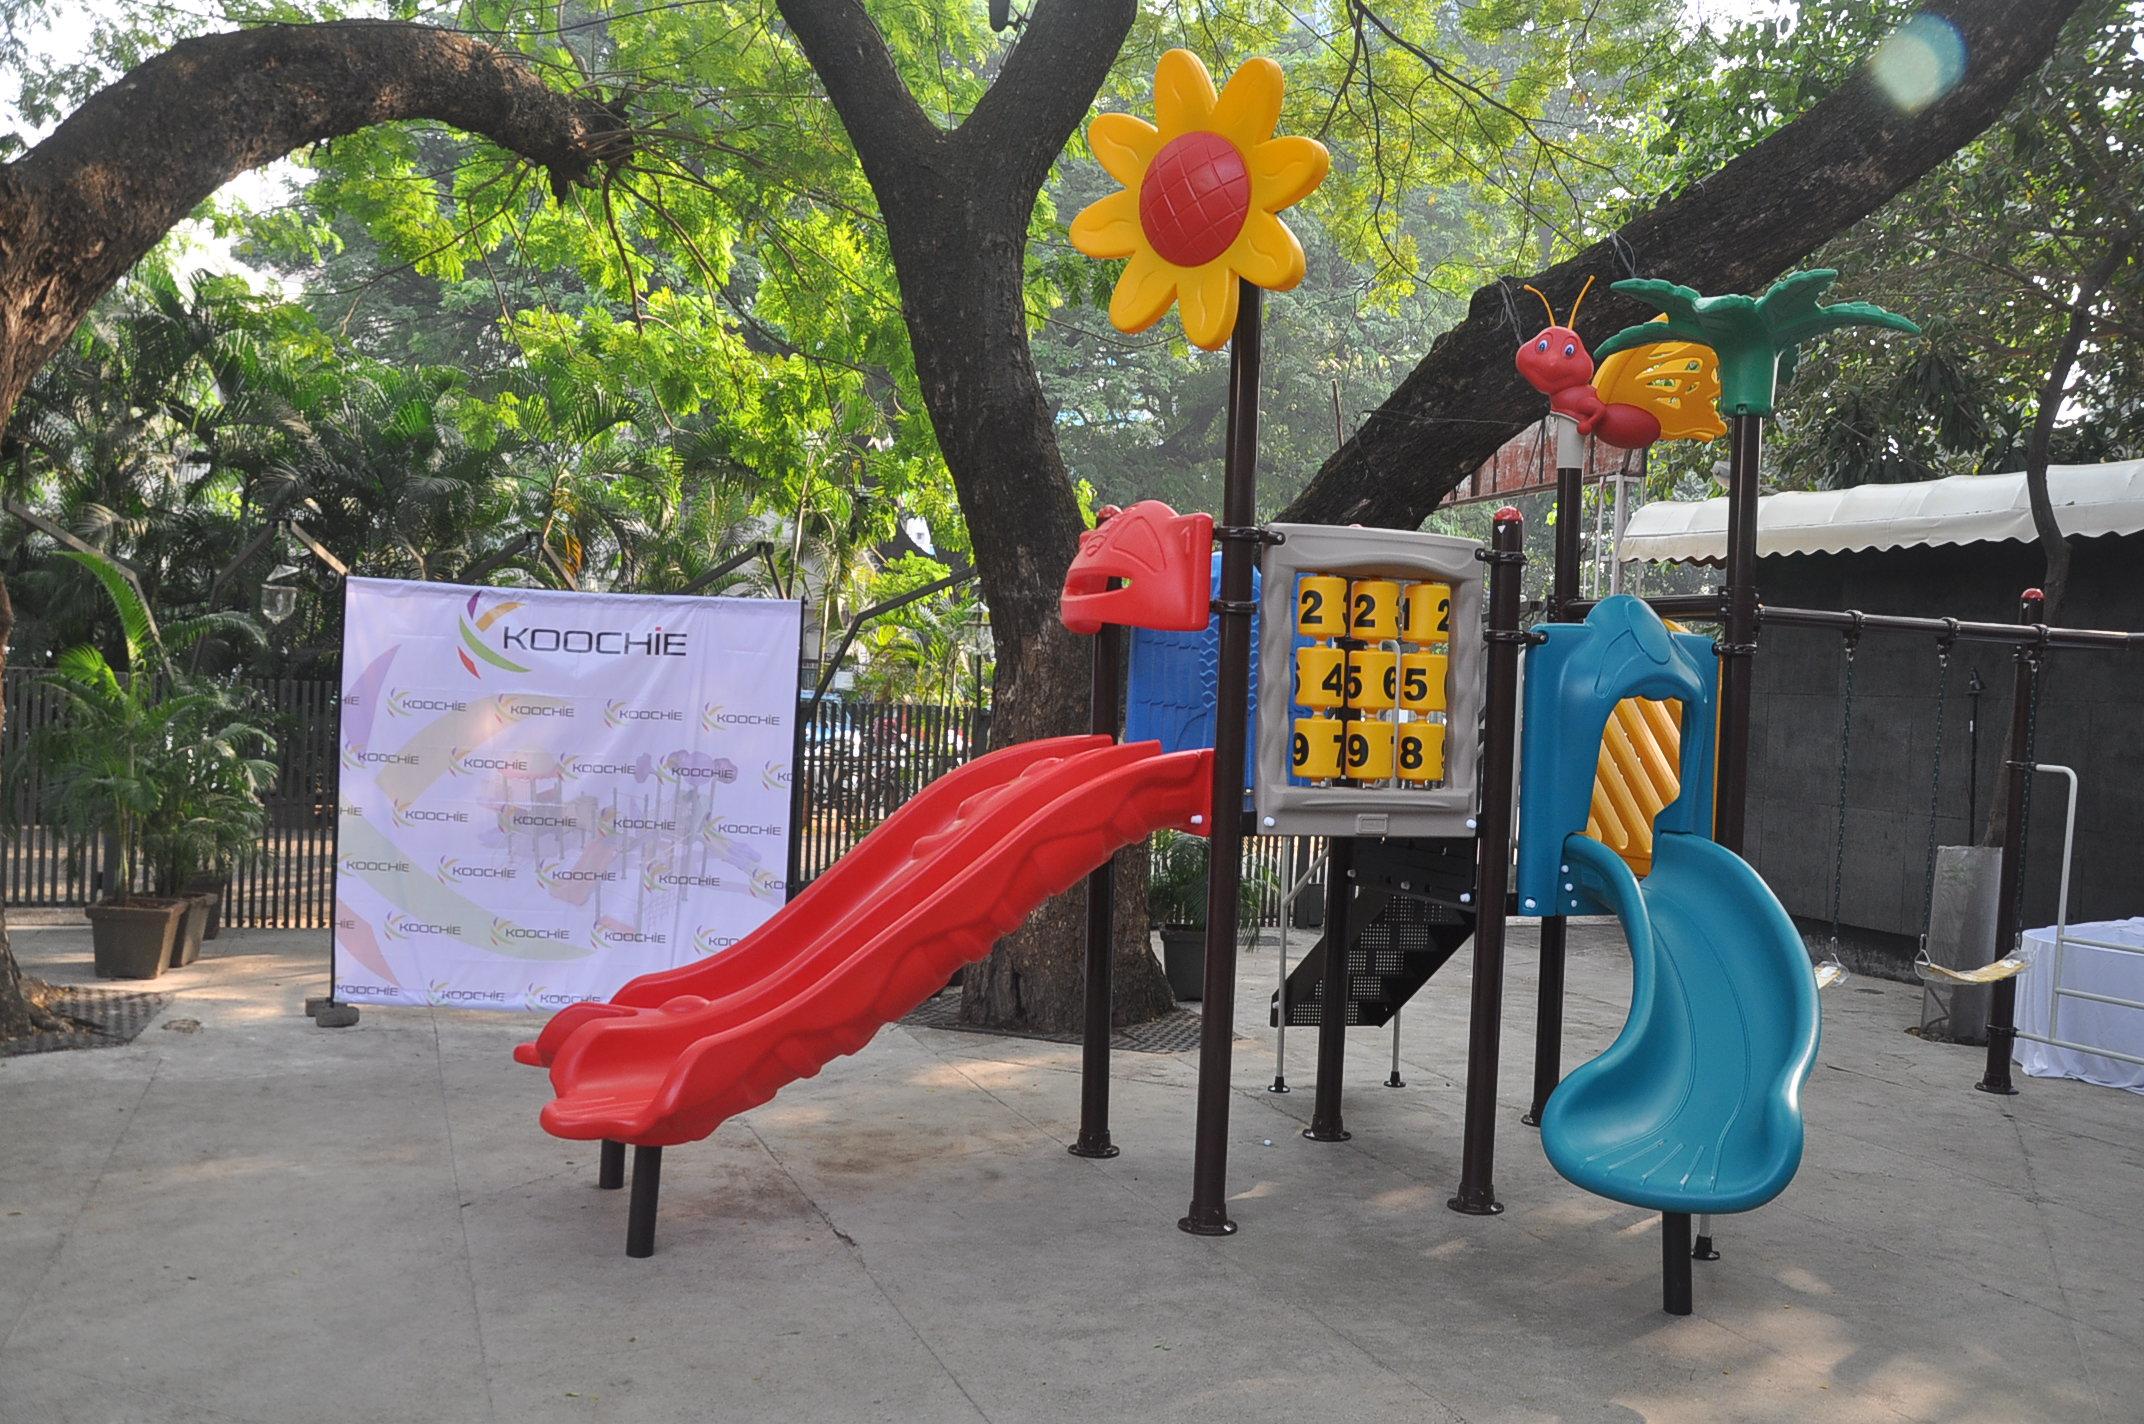 Koochie_Play_Systems_outdoor_playground_equipment.jpg